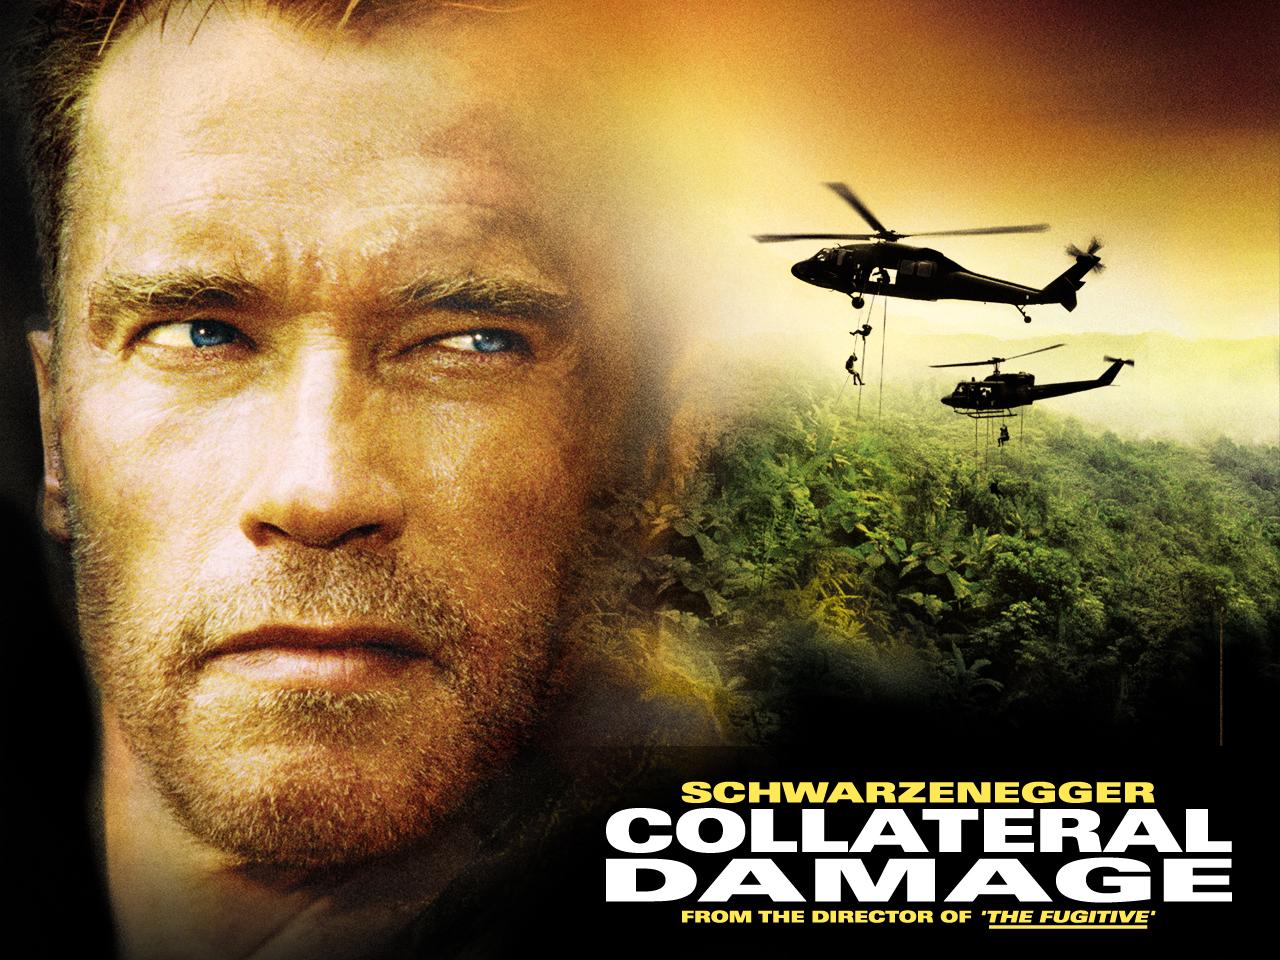 http://2.bp.blogspot.com/-DO-Ipcgyf-g/TxWNlE6xBsI/AAAAAAAAJFU/USozd9b_Deo/s1600/Arnold_Schwarzenegger_in_Collateral_Damage_Wallpaper_1_1280.jpg